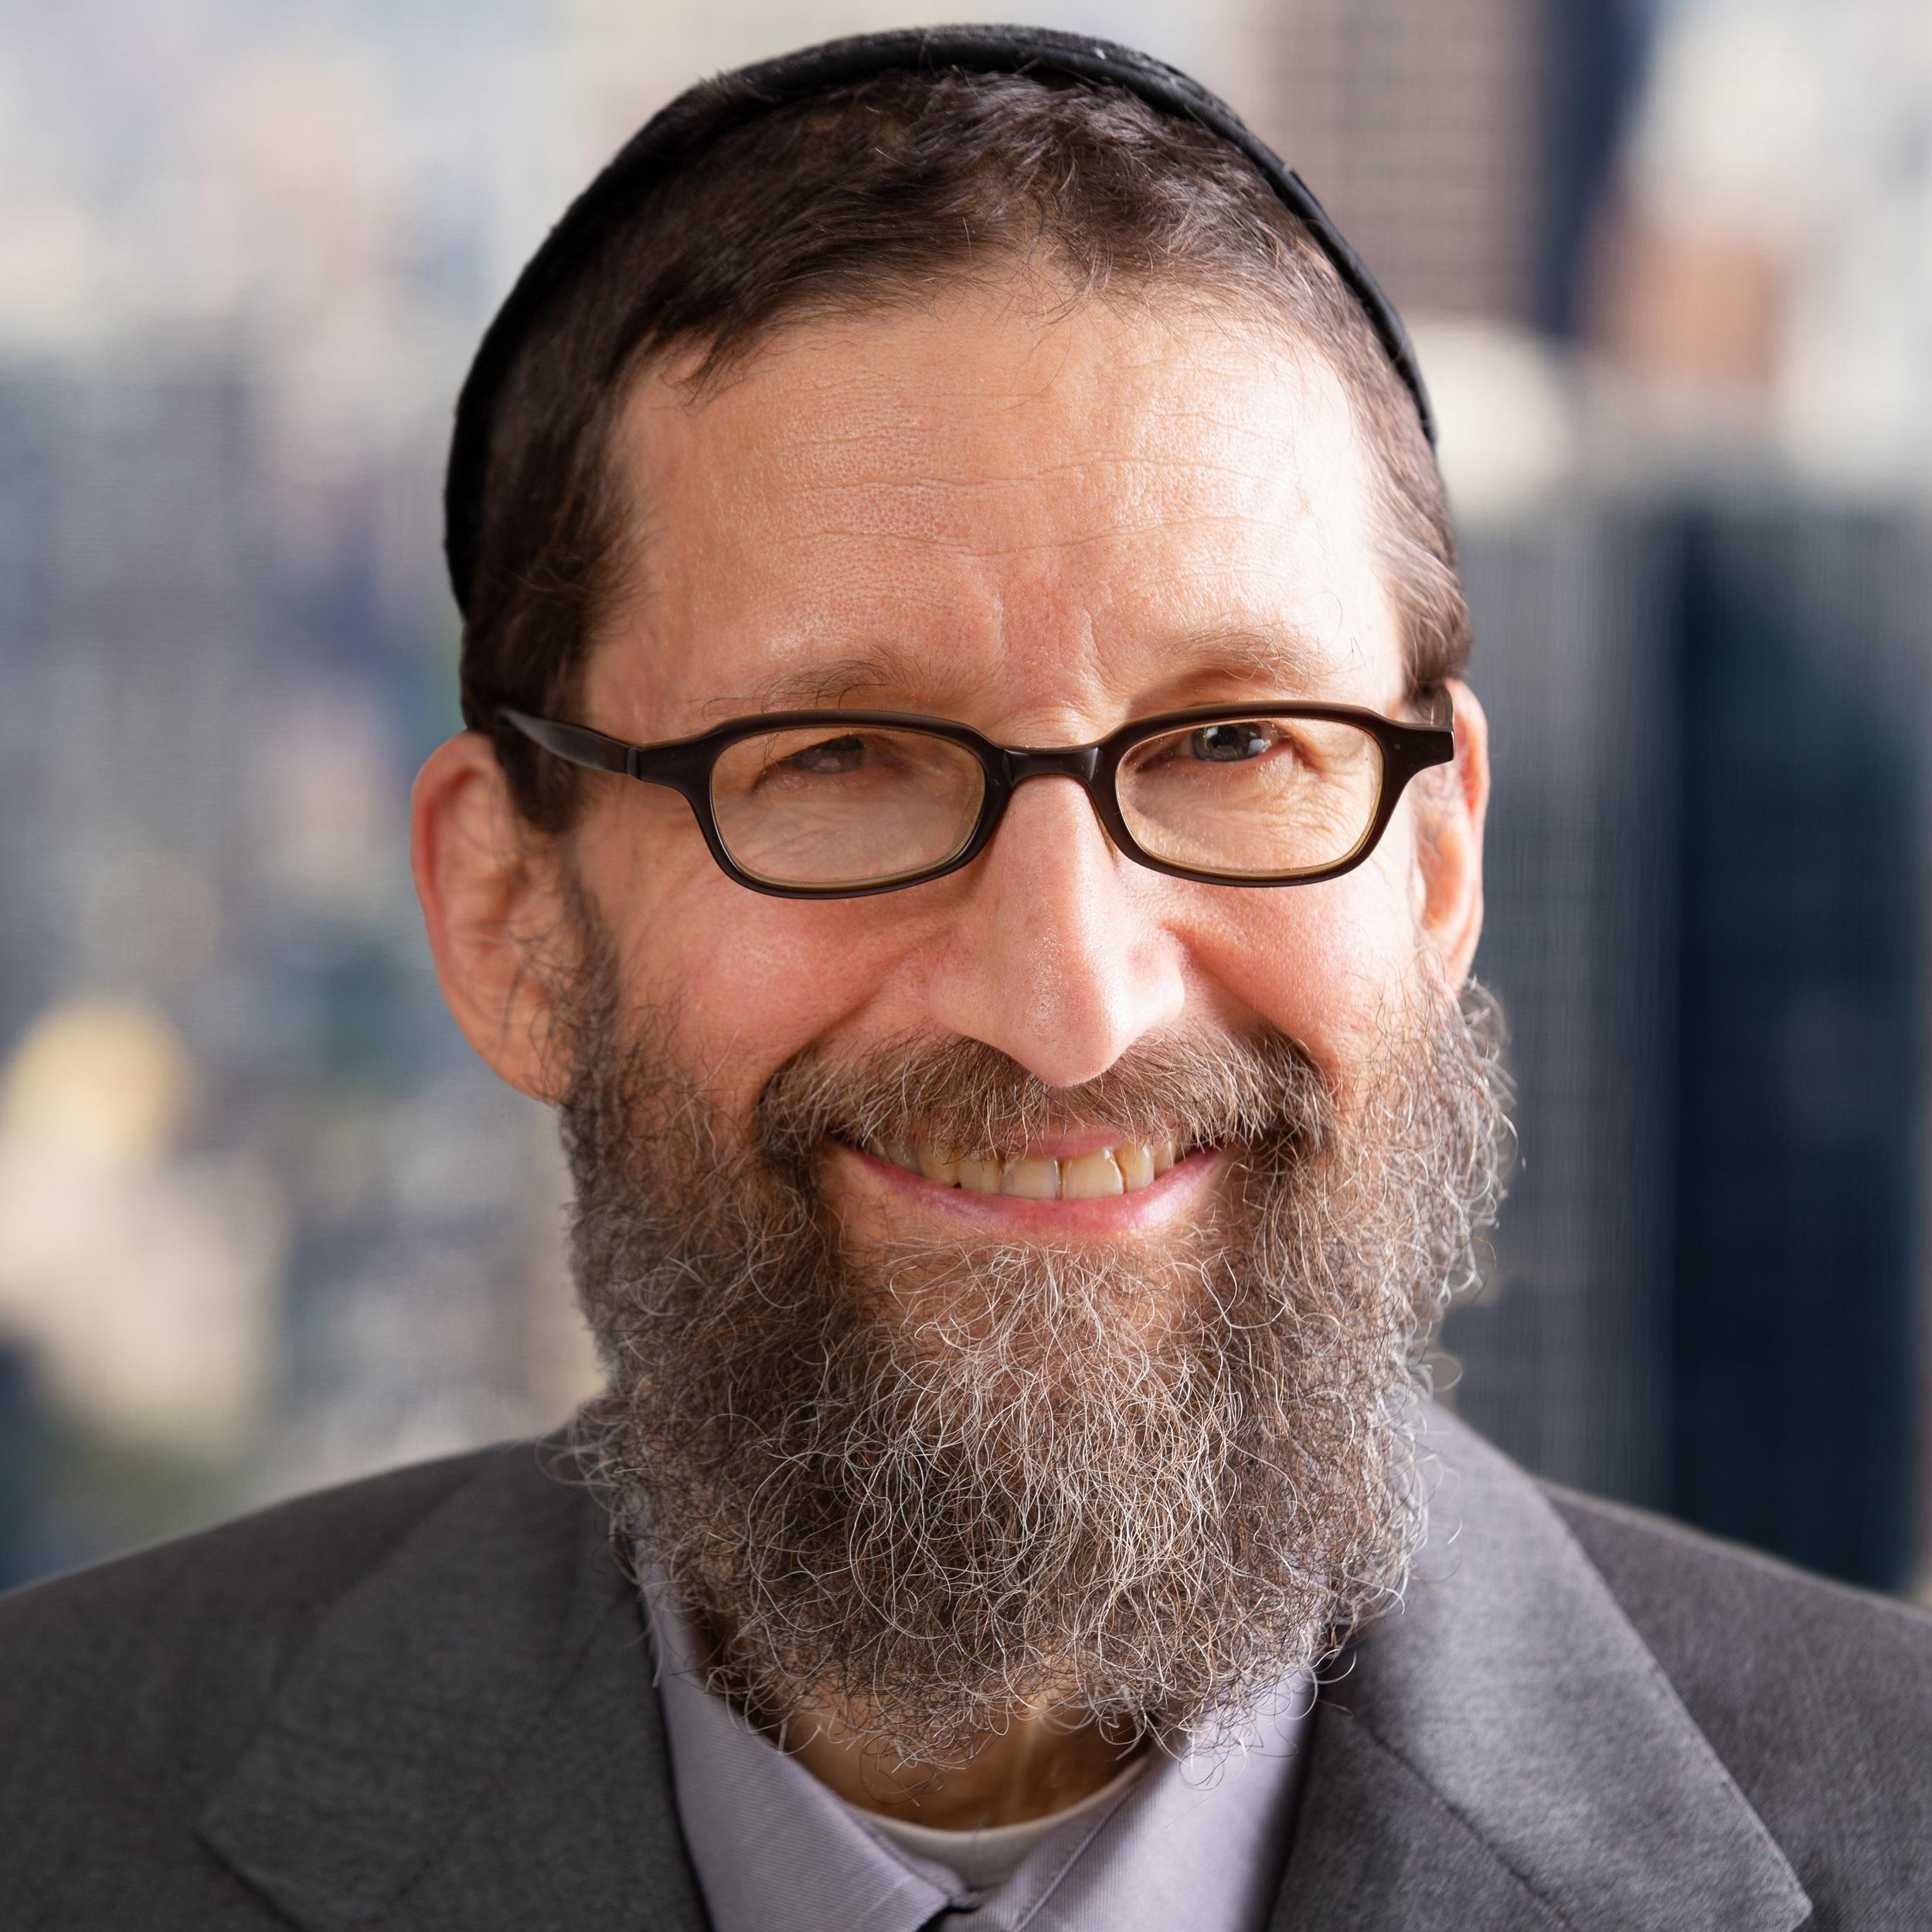 Marc S. Orlofsky, JD - Managing Director212-605-3125morlofsky@pwcpa.com